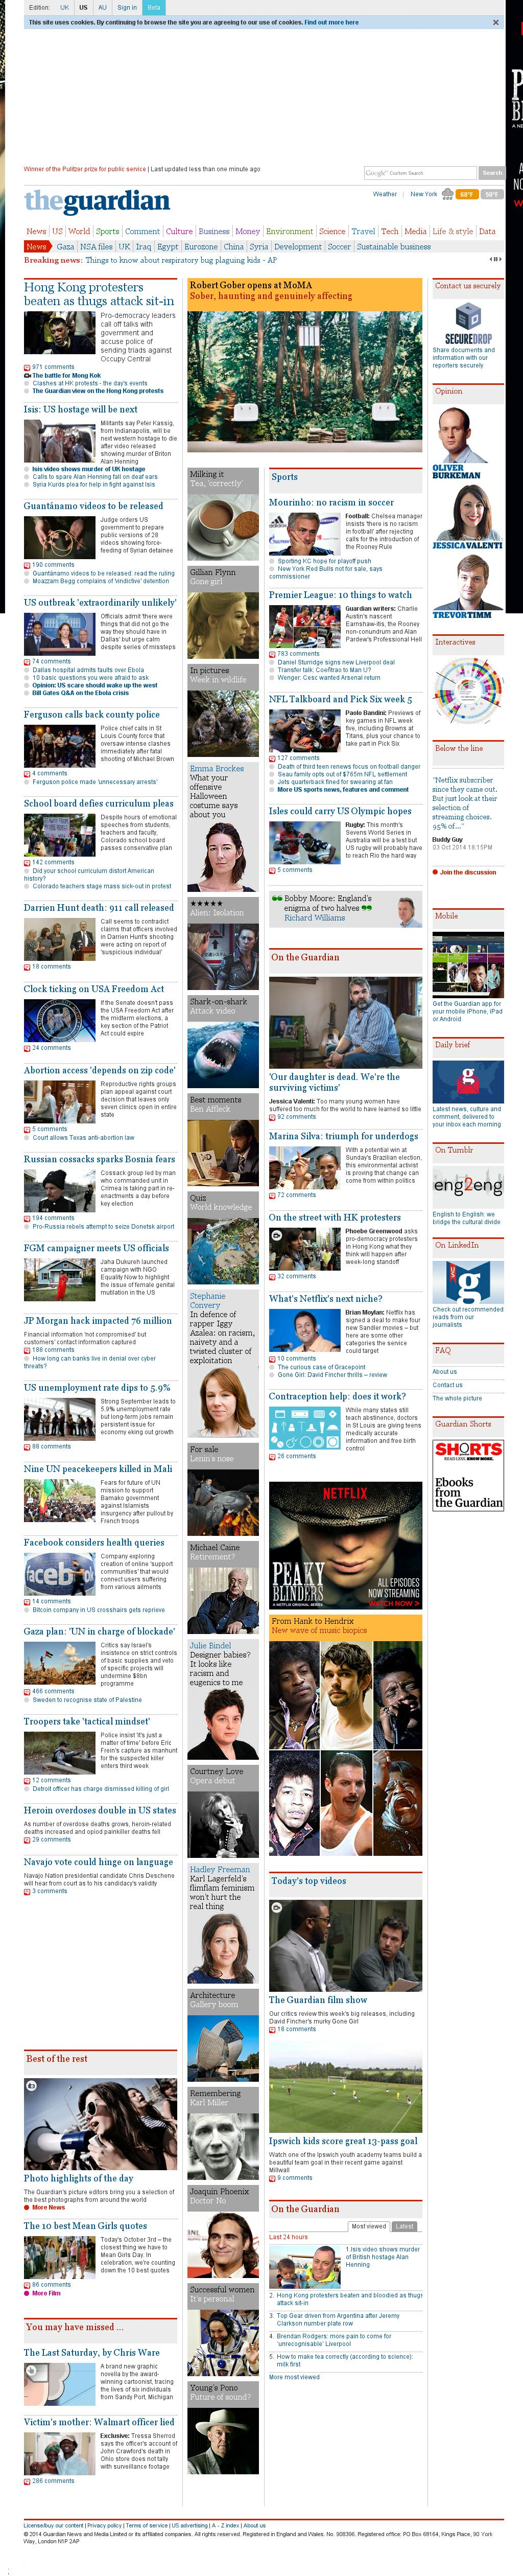 The Guardian at Saturday Oct. 4, 2014, 1:11 a.m. UTC